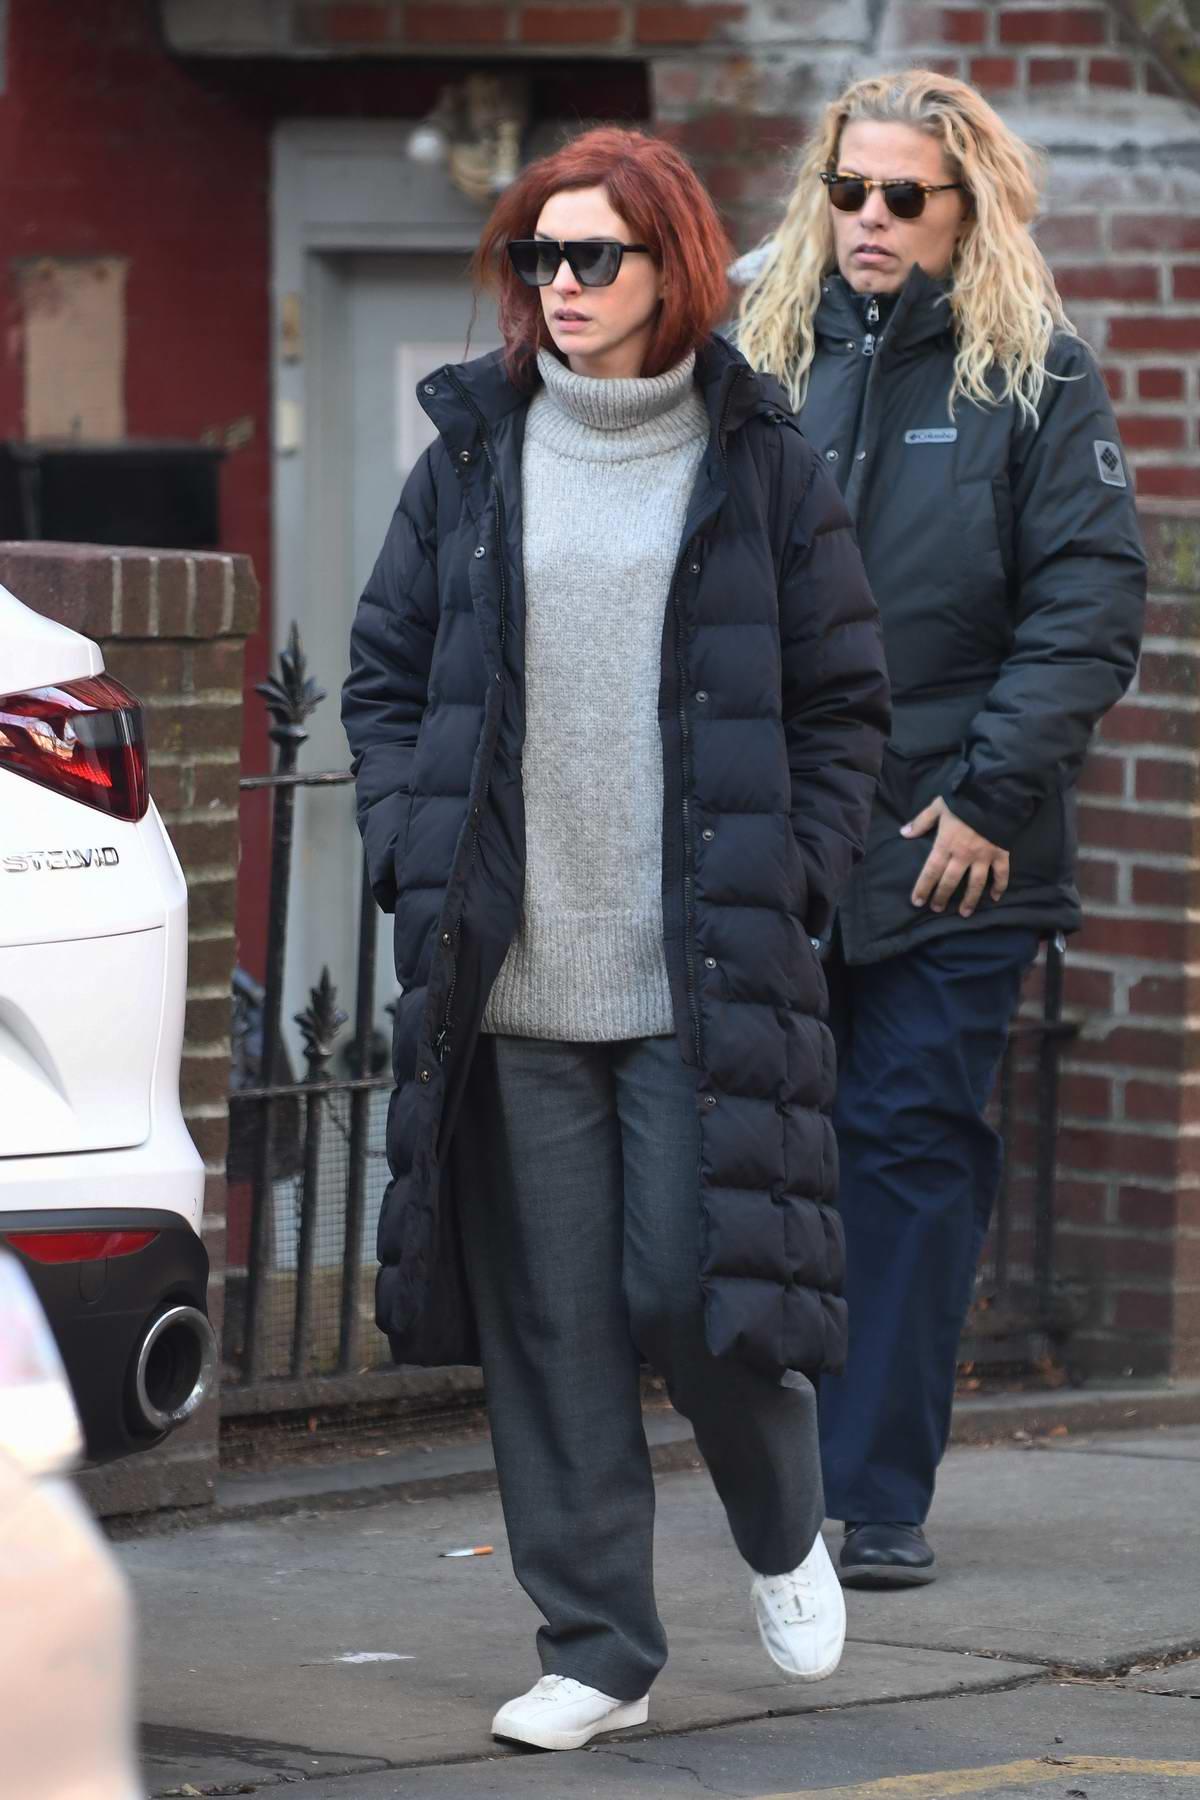 Anne Hathaway hide behind dark sunglasses on her way to set to film 'Modern Love' in New York City